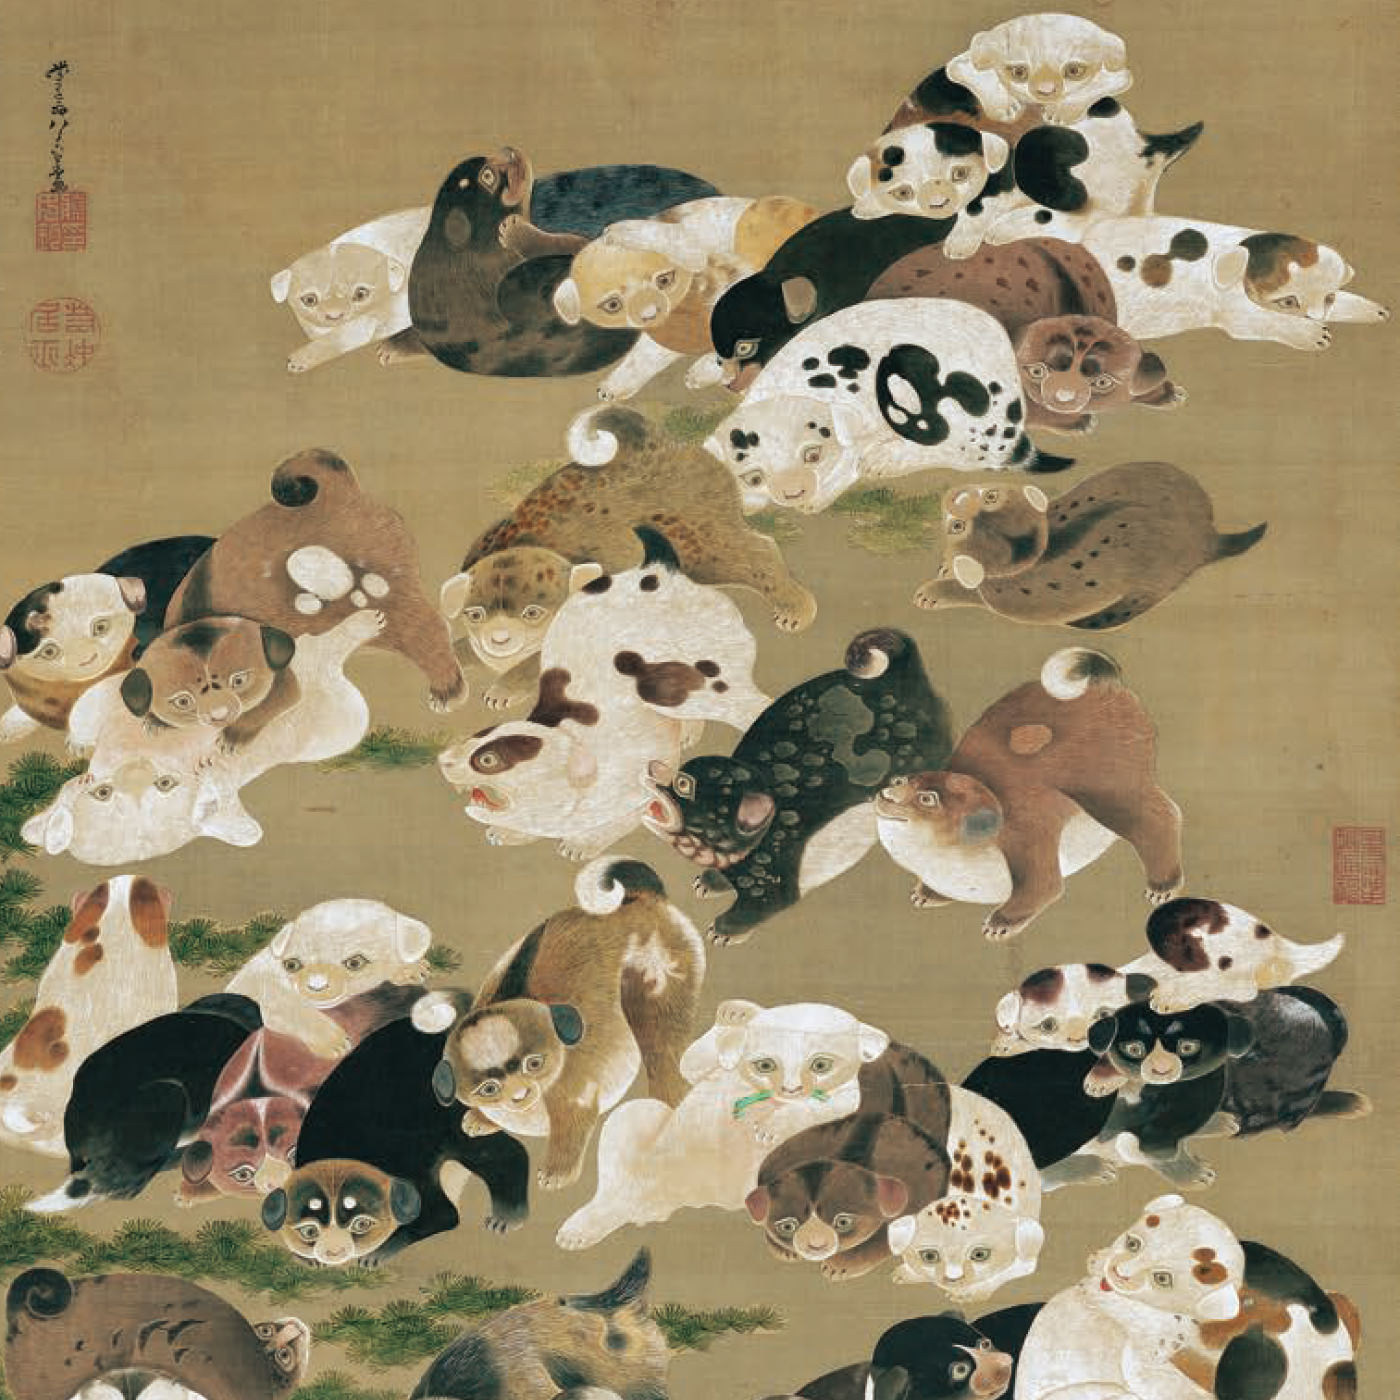 伊藤若冲展が福島県立美術館で開催